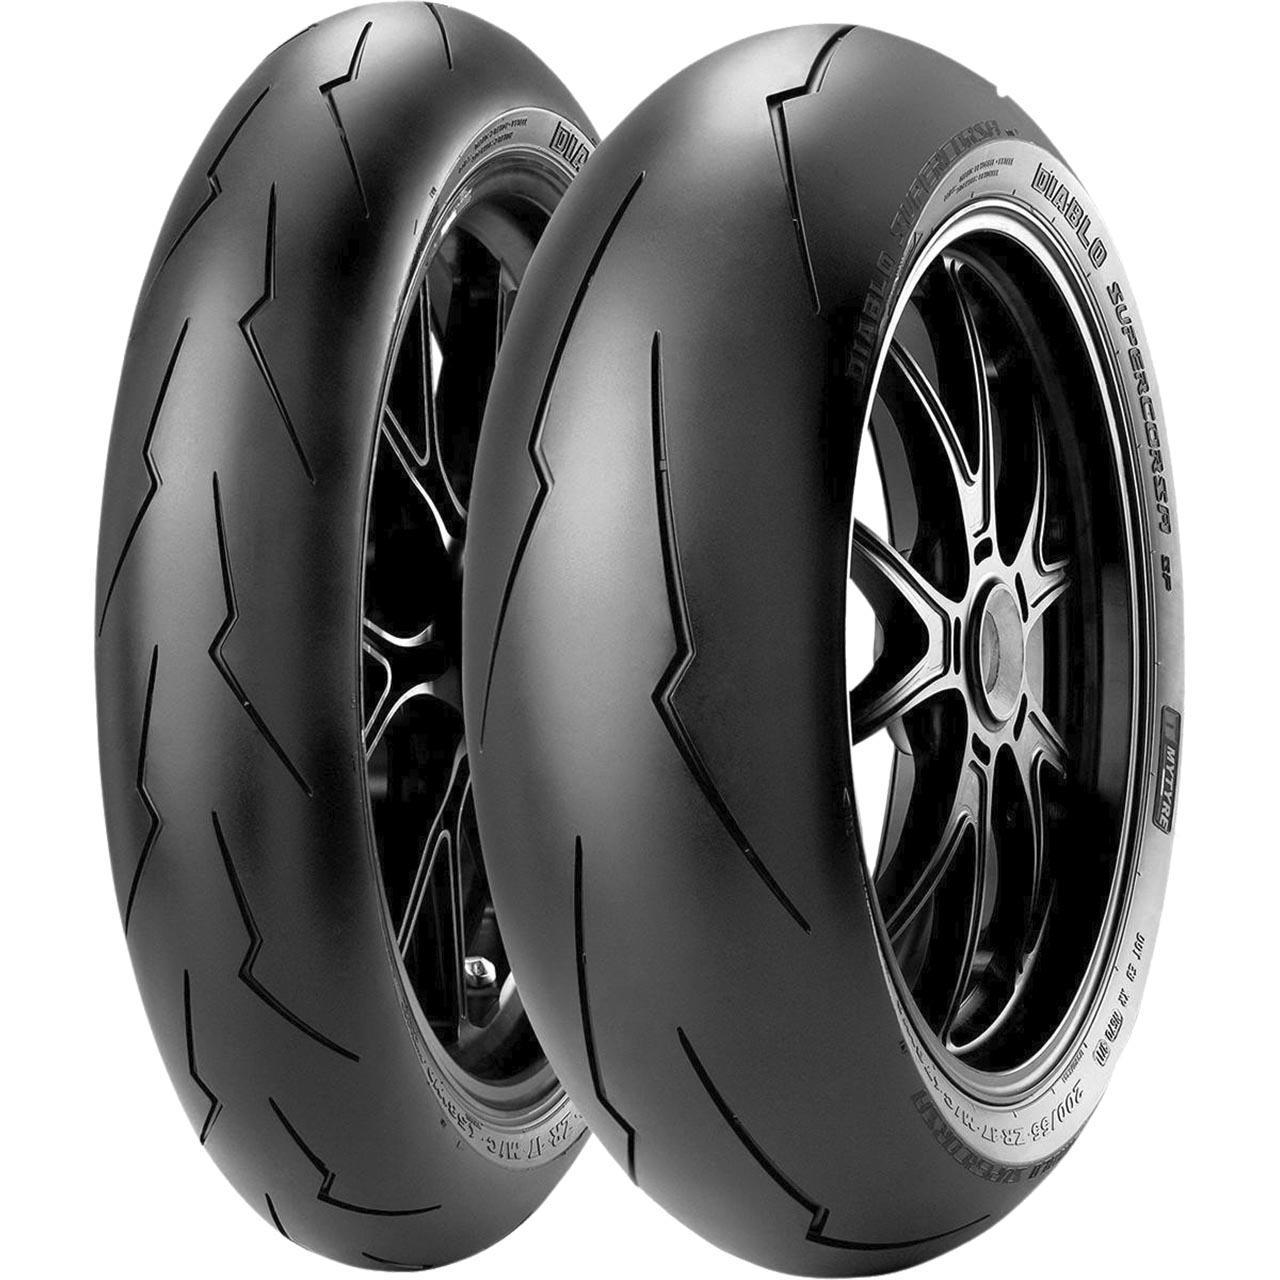 Pirelli Diablo Supercorsa V3 SP Rear 180/55ZR17 M/C (73W) TL